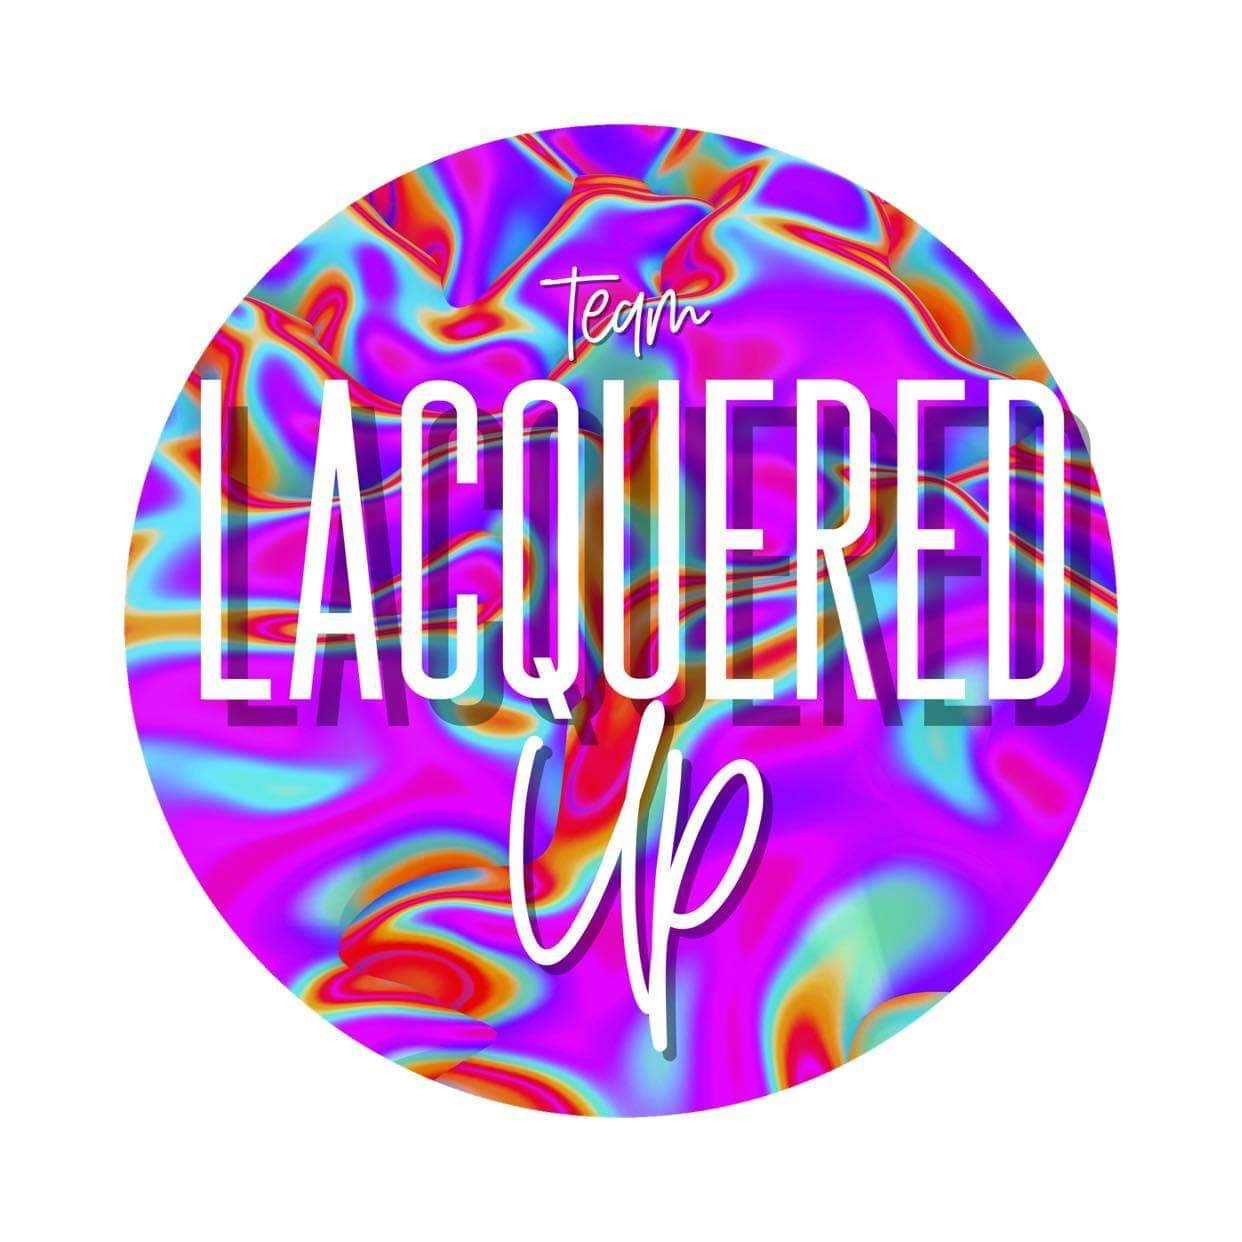 lacqured-up-logo.jpg